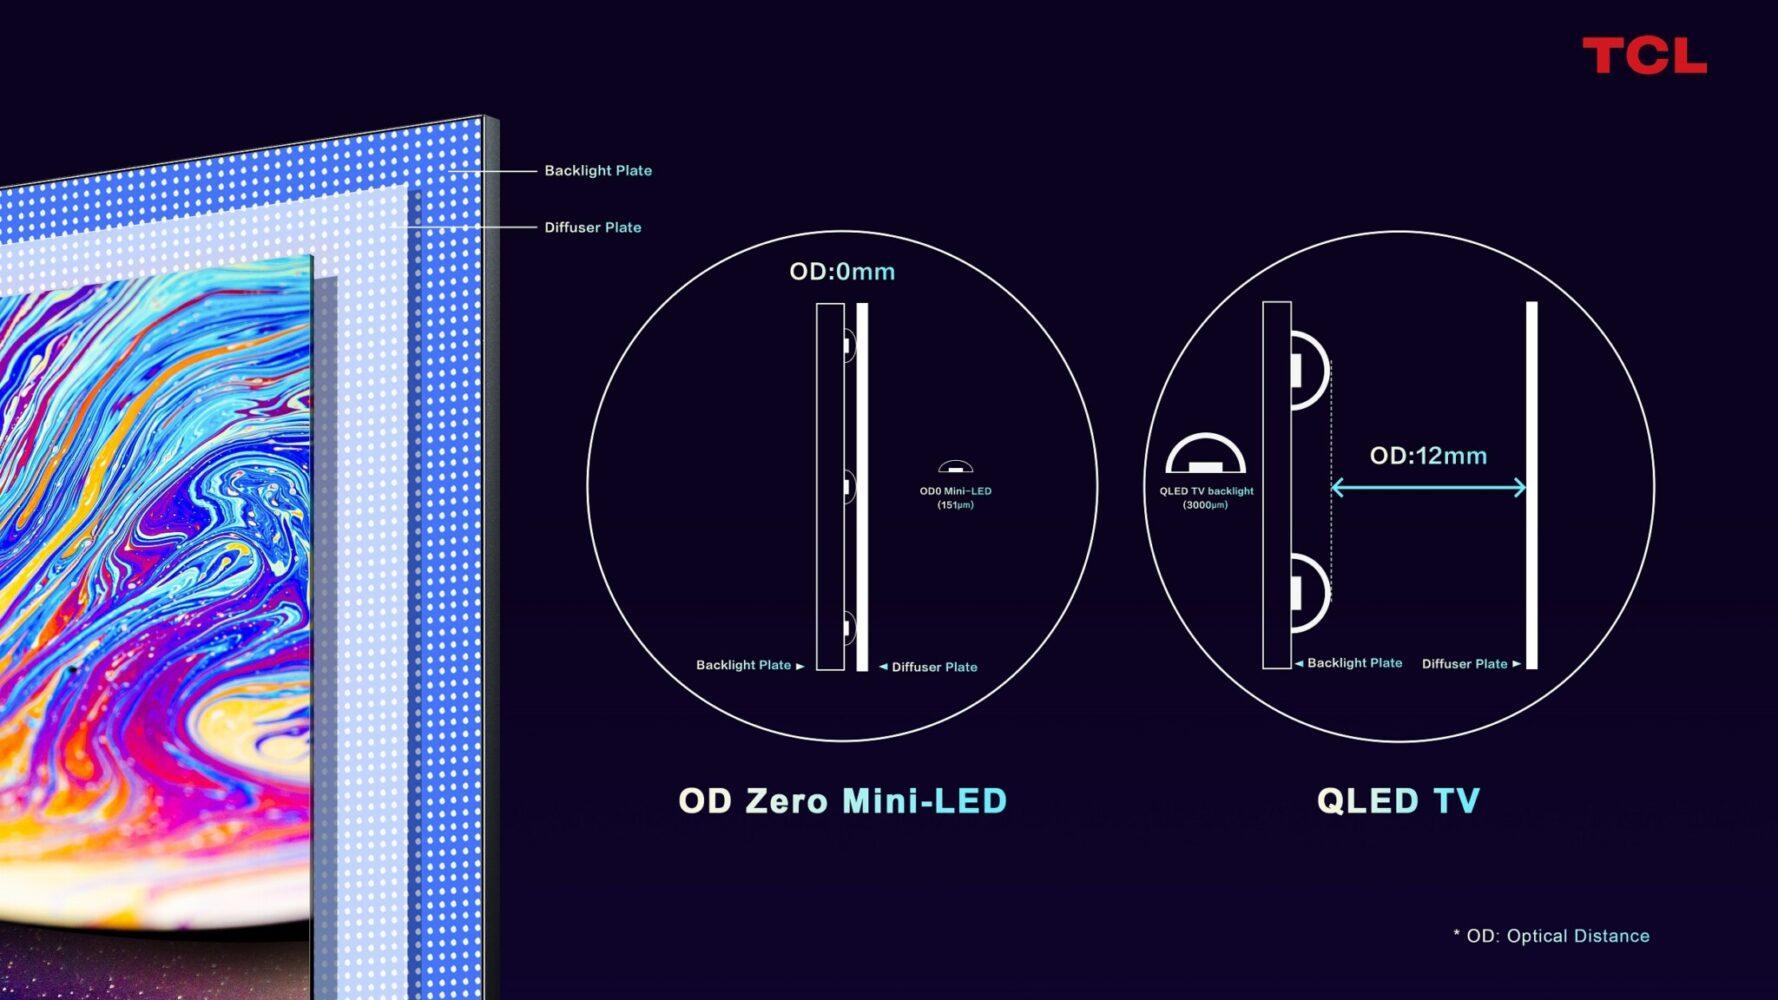 Mini-LED OD Zero